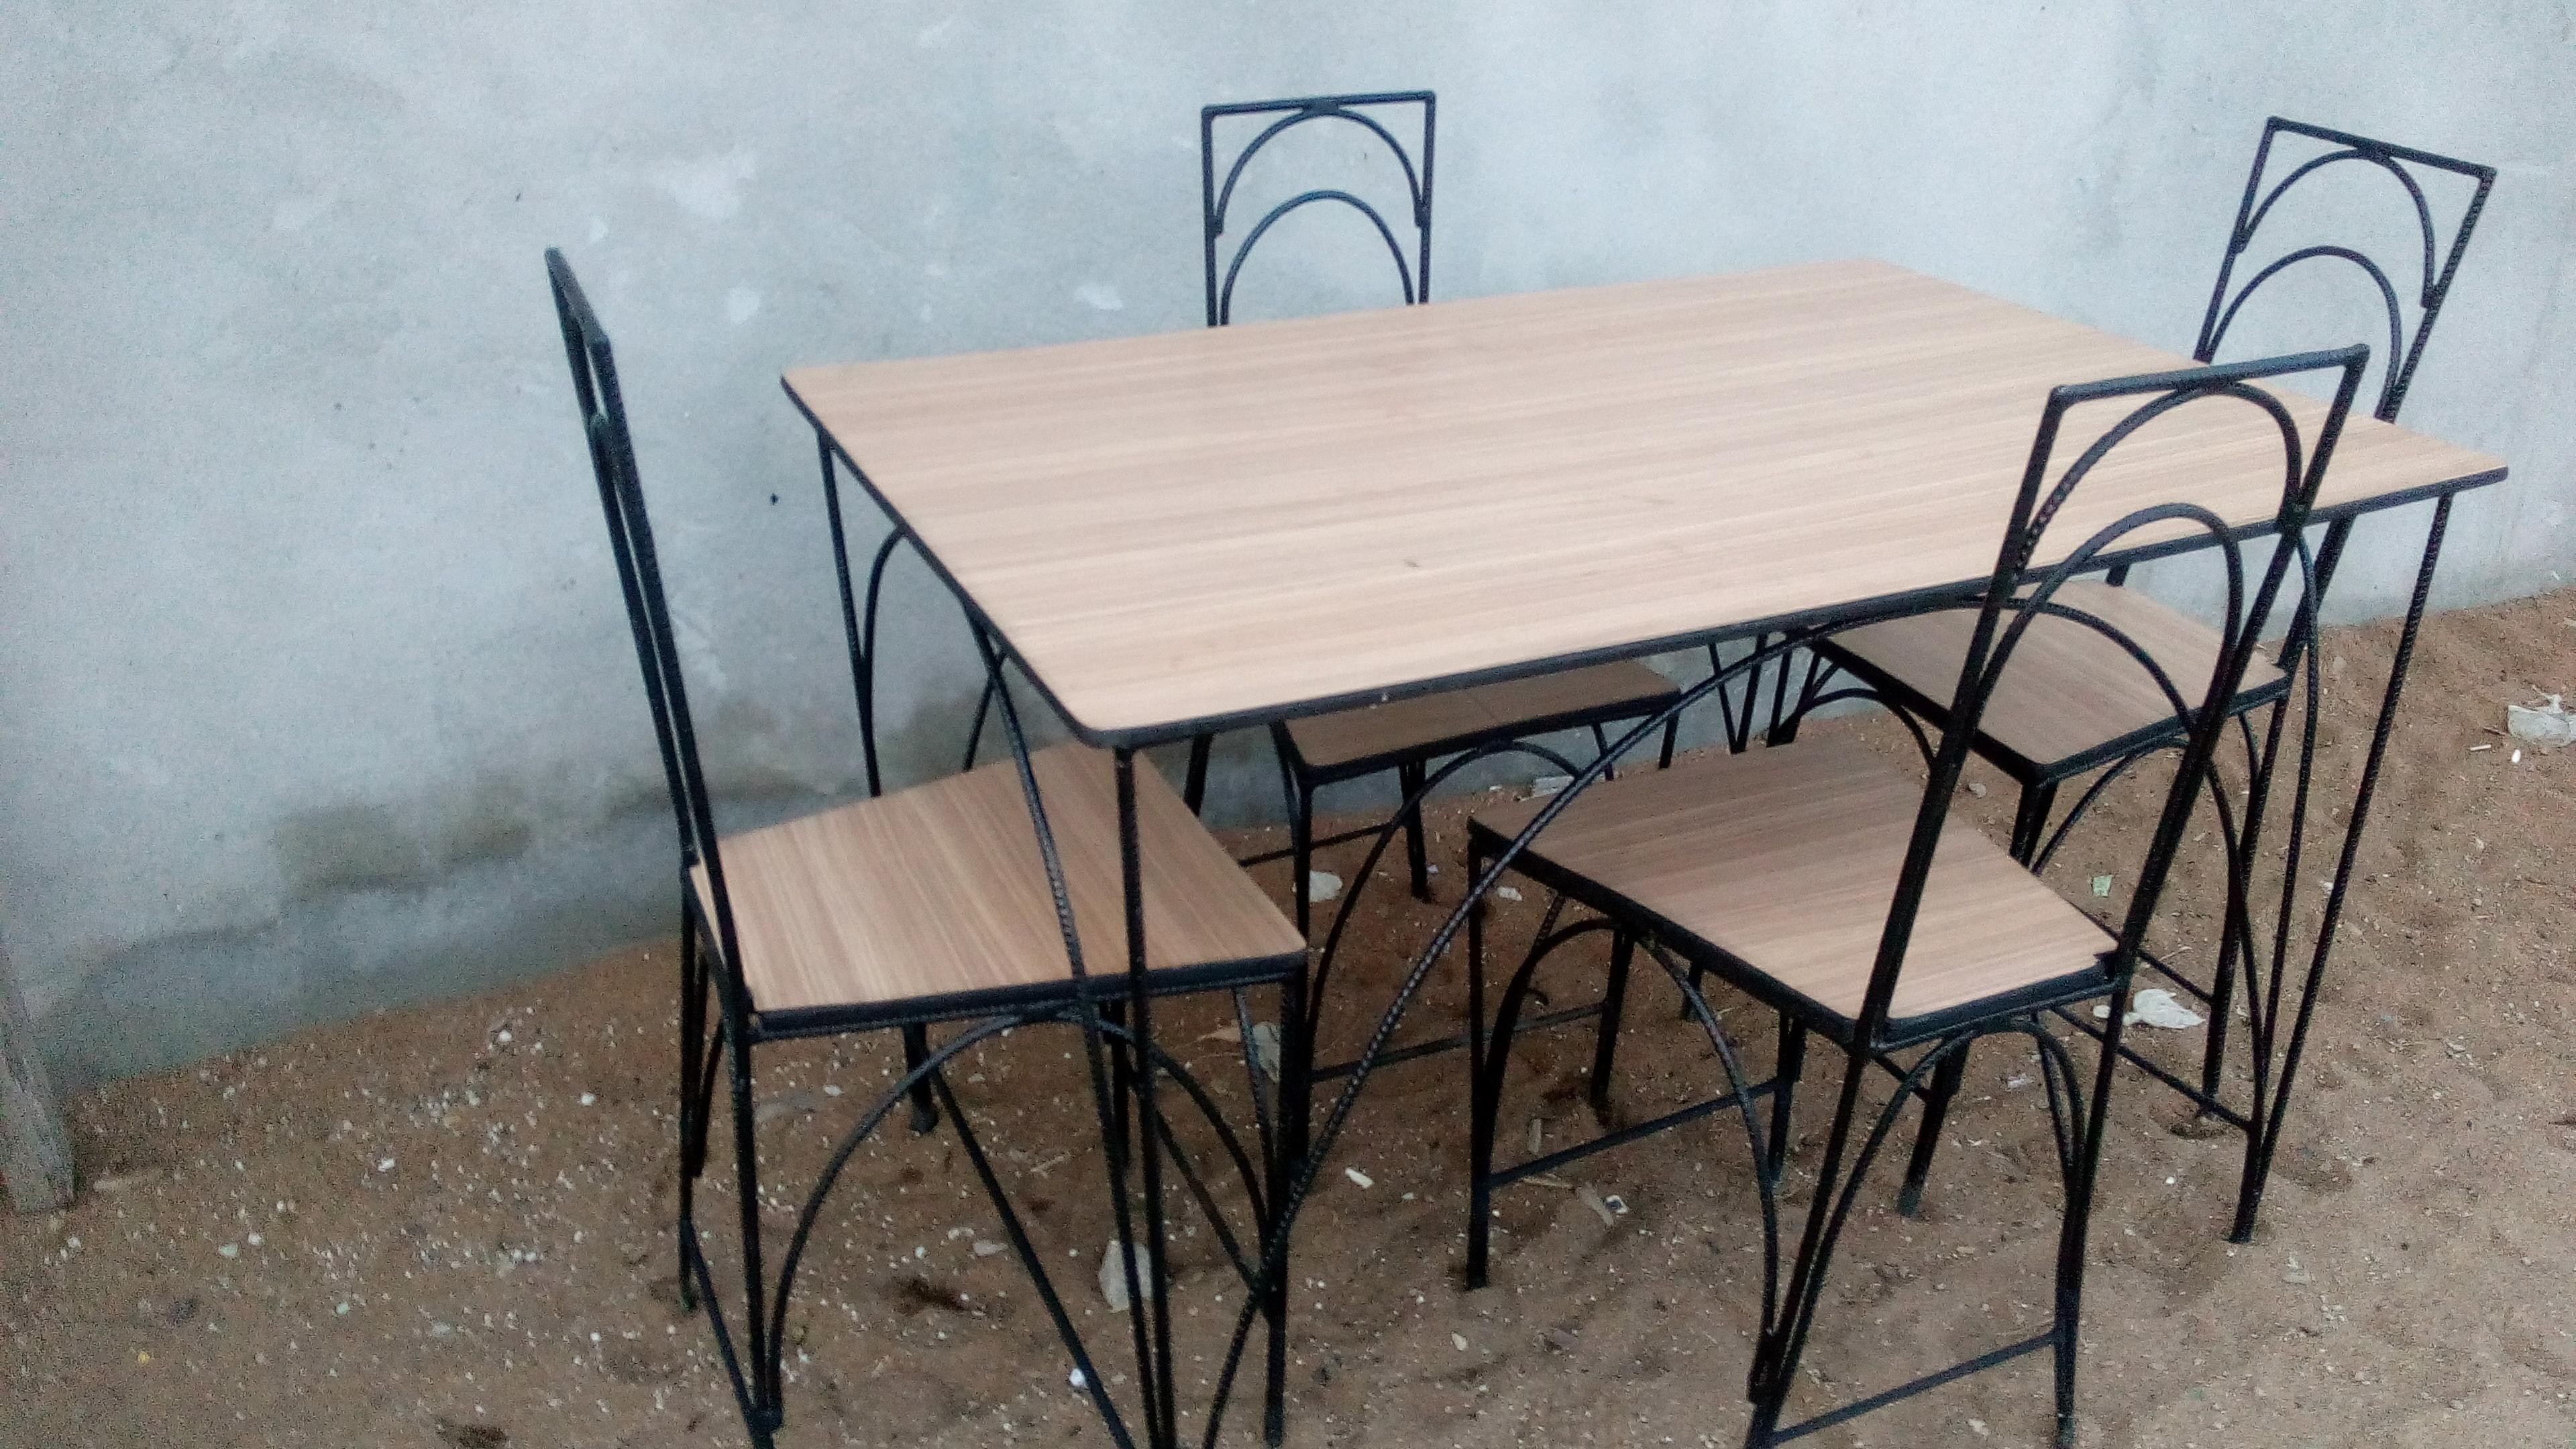 Table À Manger Fer Forgé Et Bois | Home Decor, Dining Table concernant Table Salle A Manger En Fer Forgé